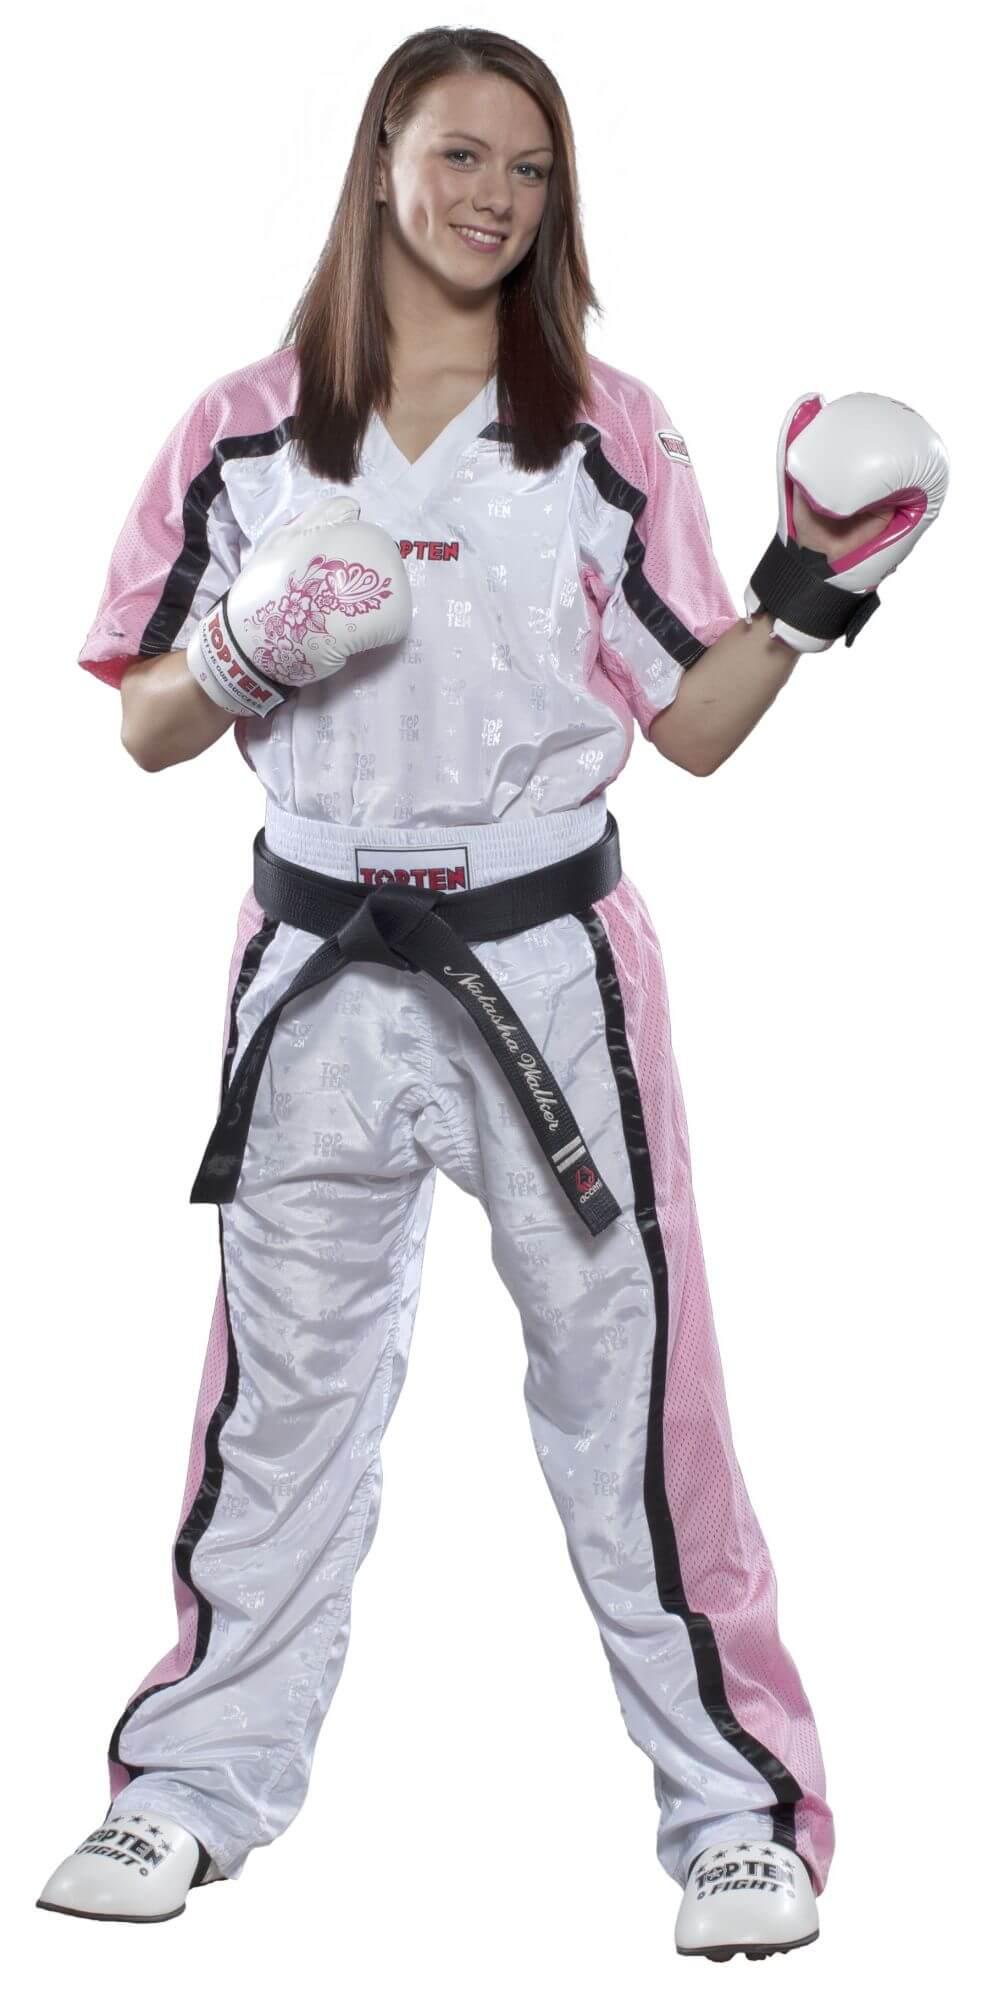 Kickboxhose Mesh Weiss-Pink komplett